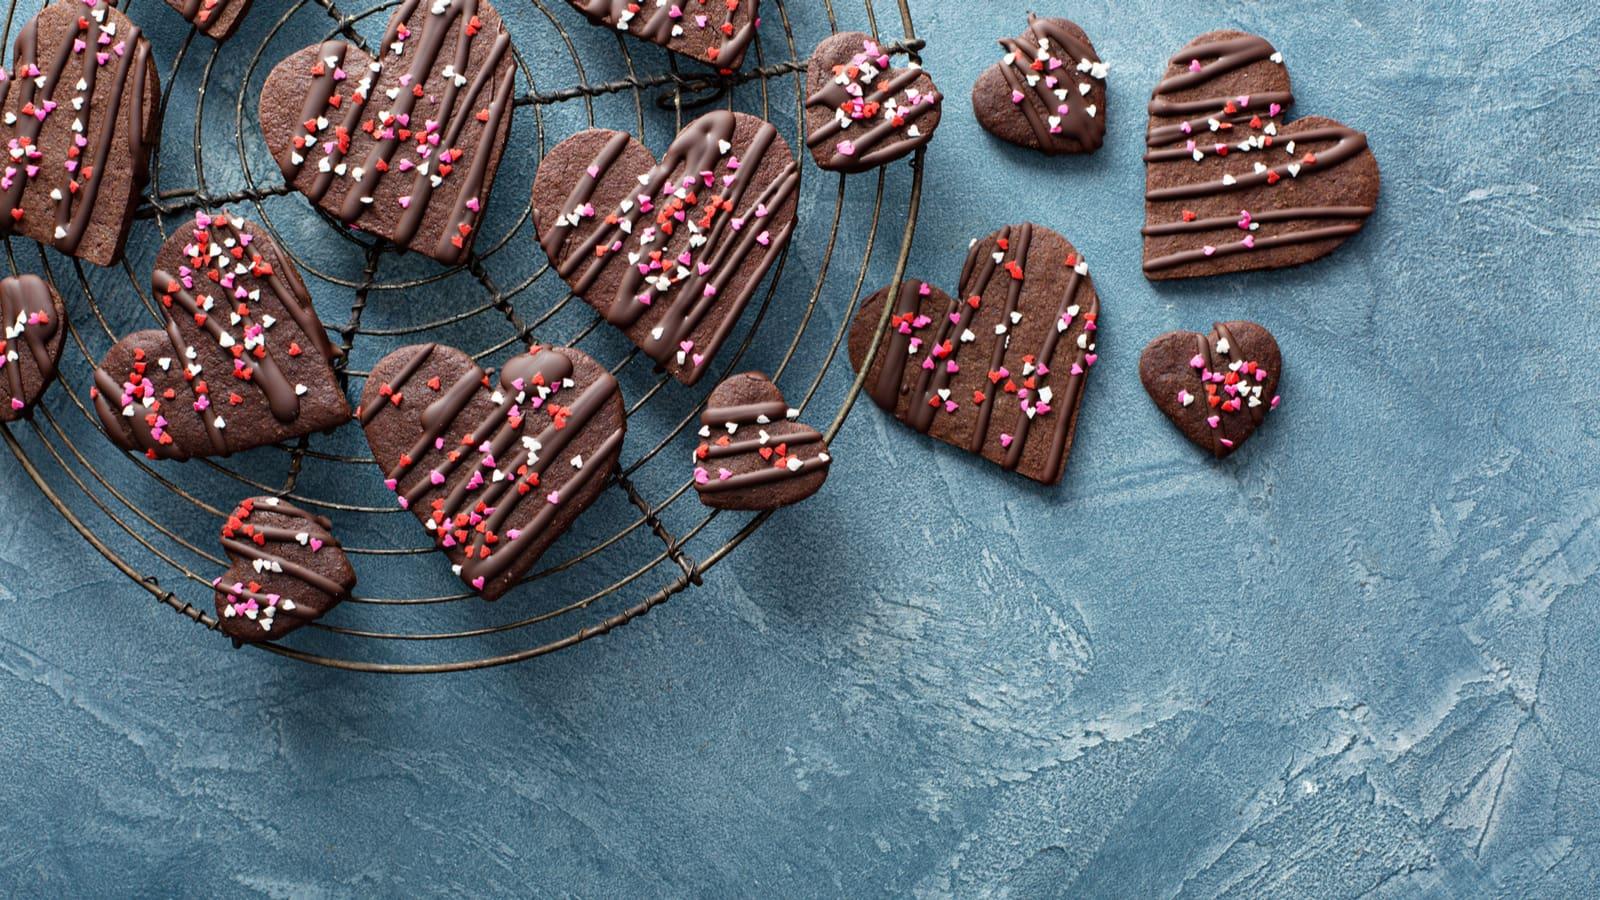 Chocolate heart-shaped cookies.